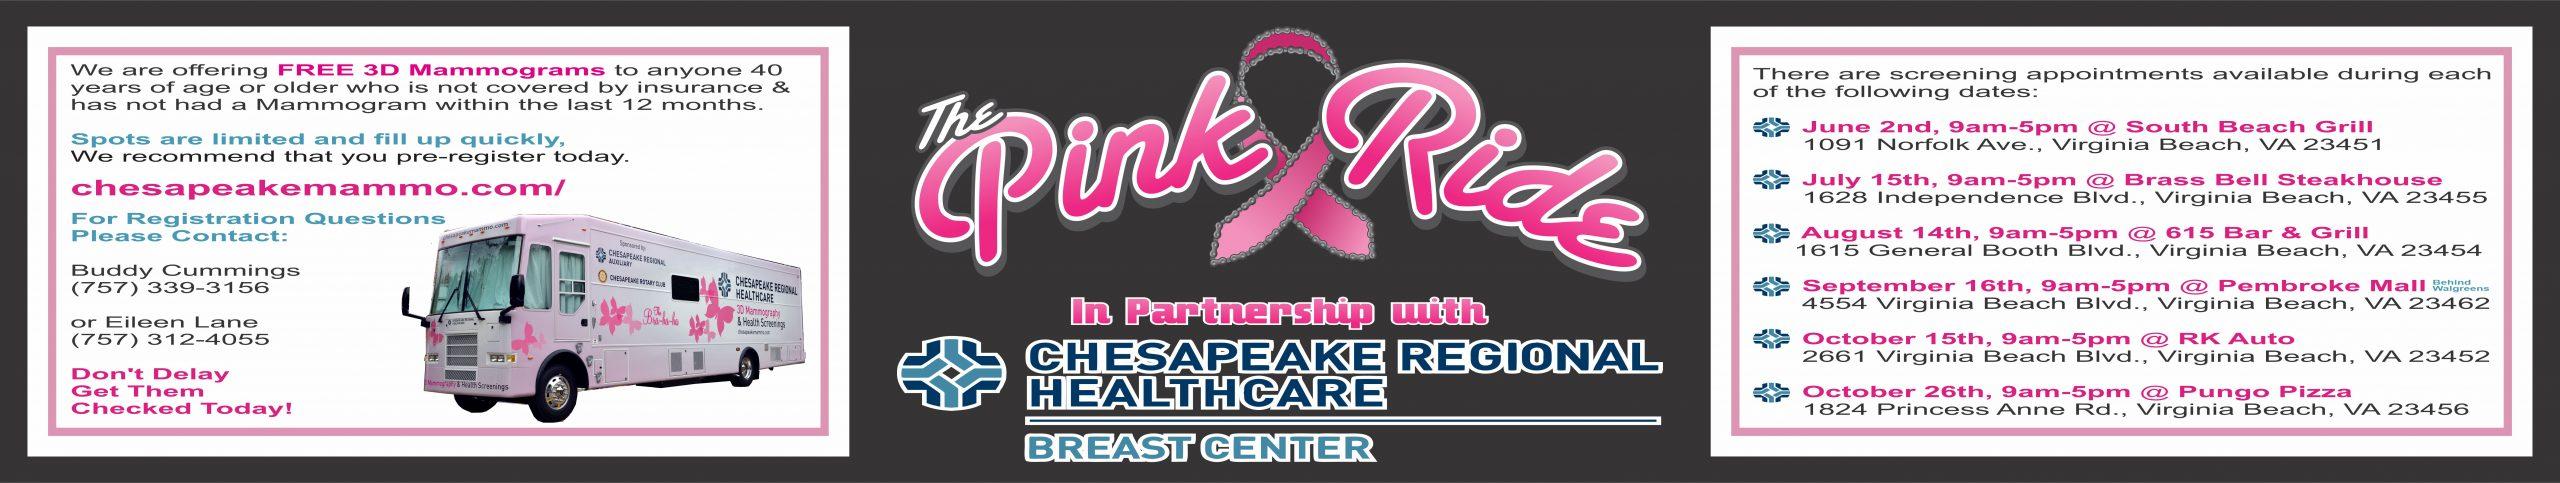 2021 Pink Ride Chesapeake Regional Healthcare Free Mammogram Event